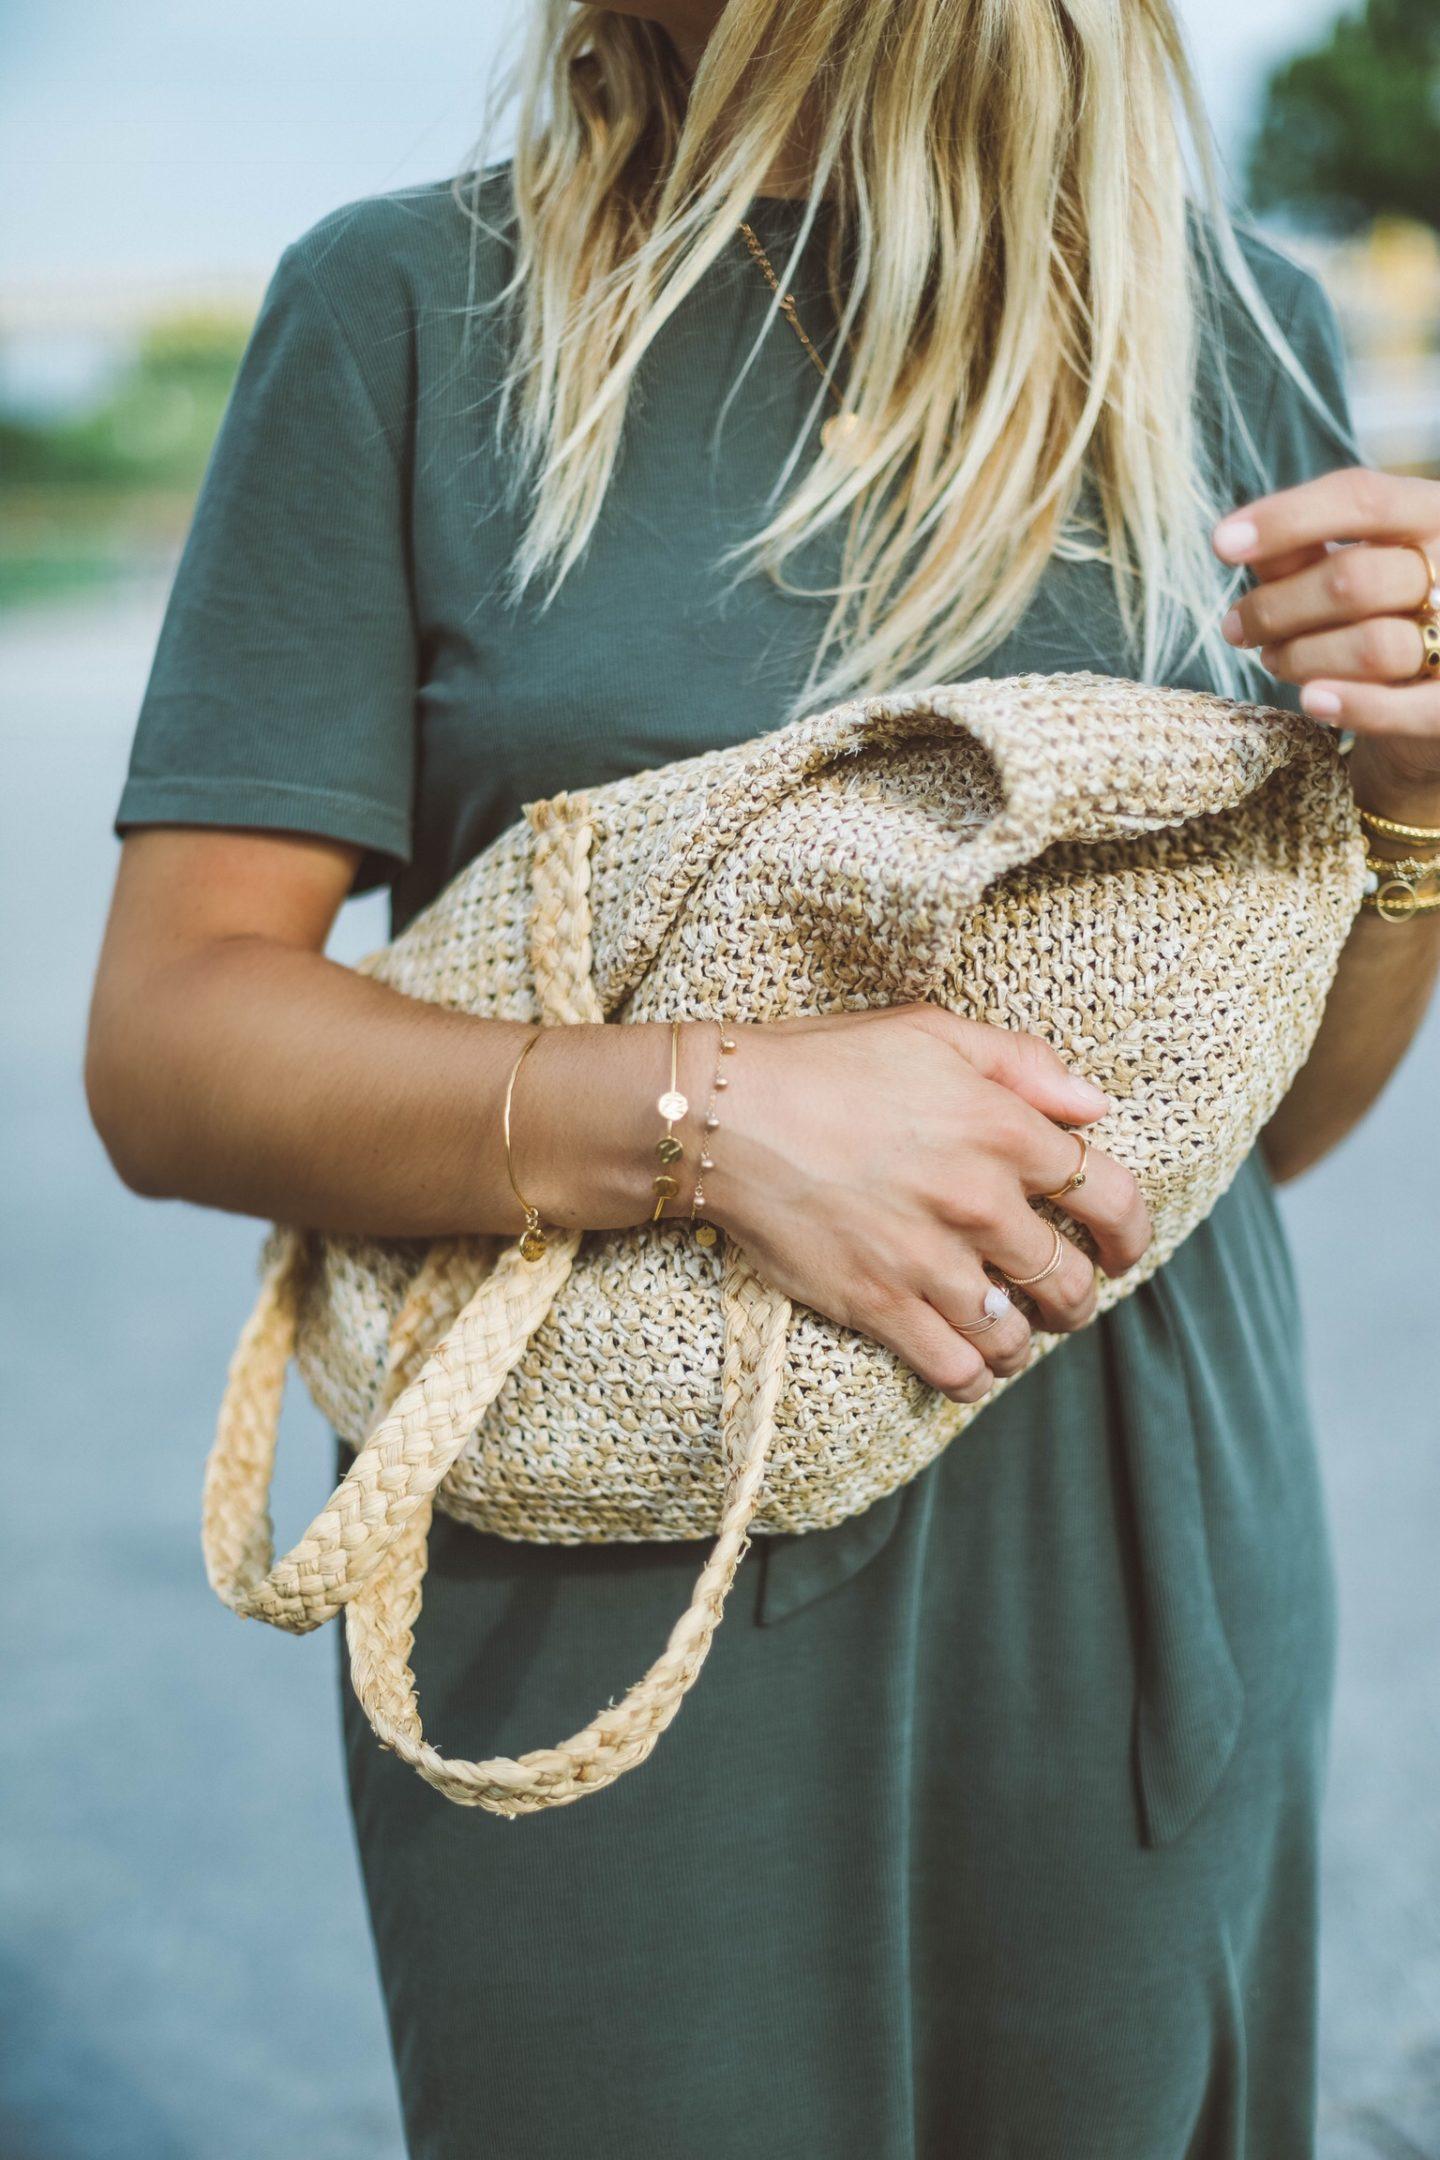 Bijoux Leon - Blondie Baby blog mode Paris et voyages